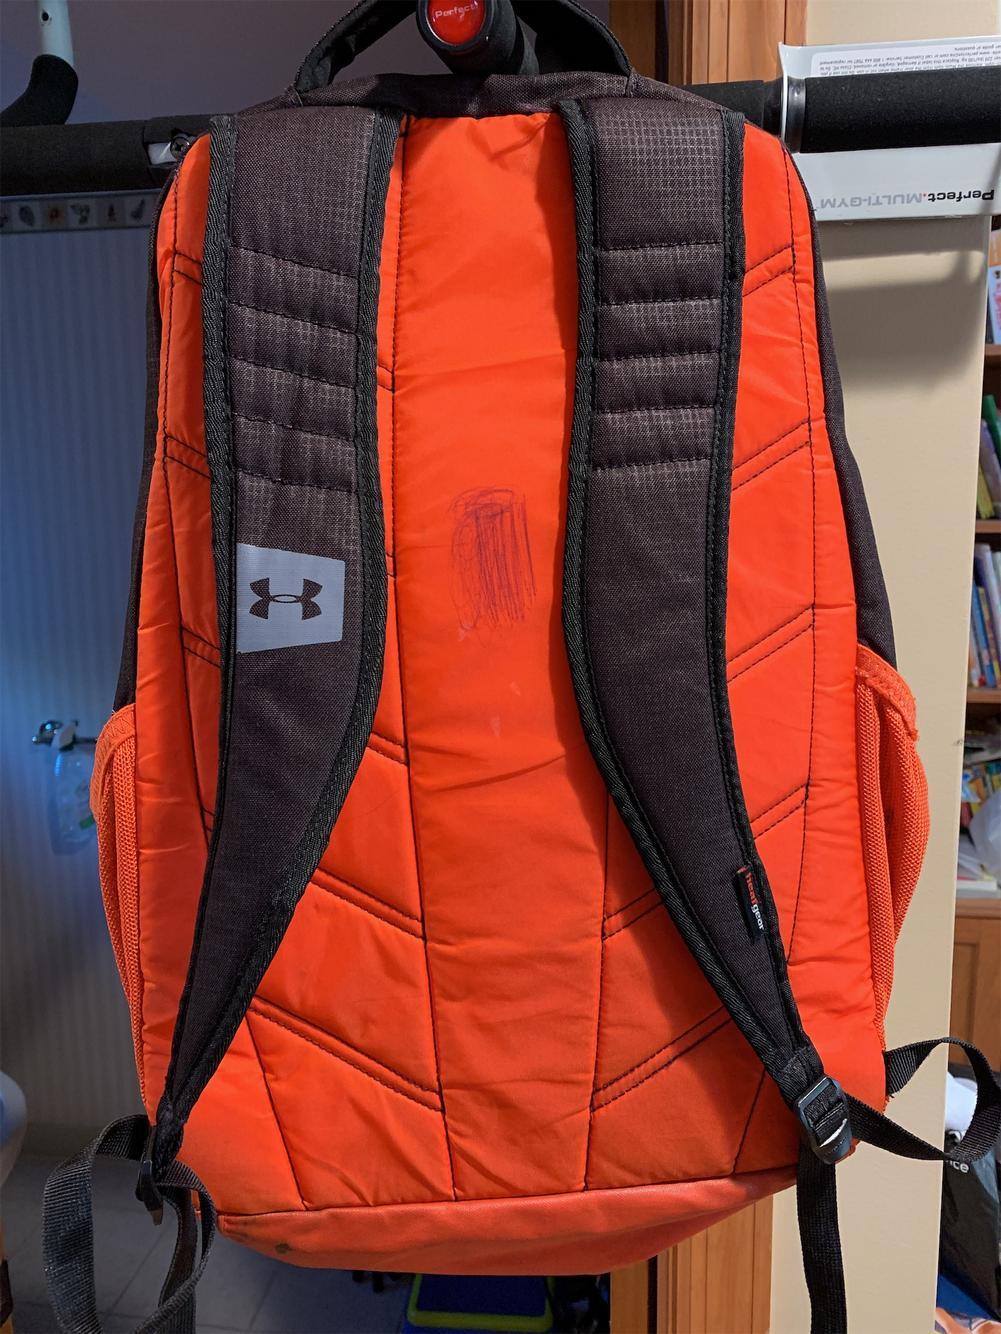 acento montículo Predecir  Under Armour Storm Backpack   Hike & Camp Backpacks